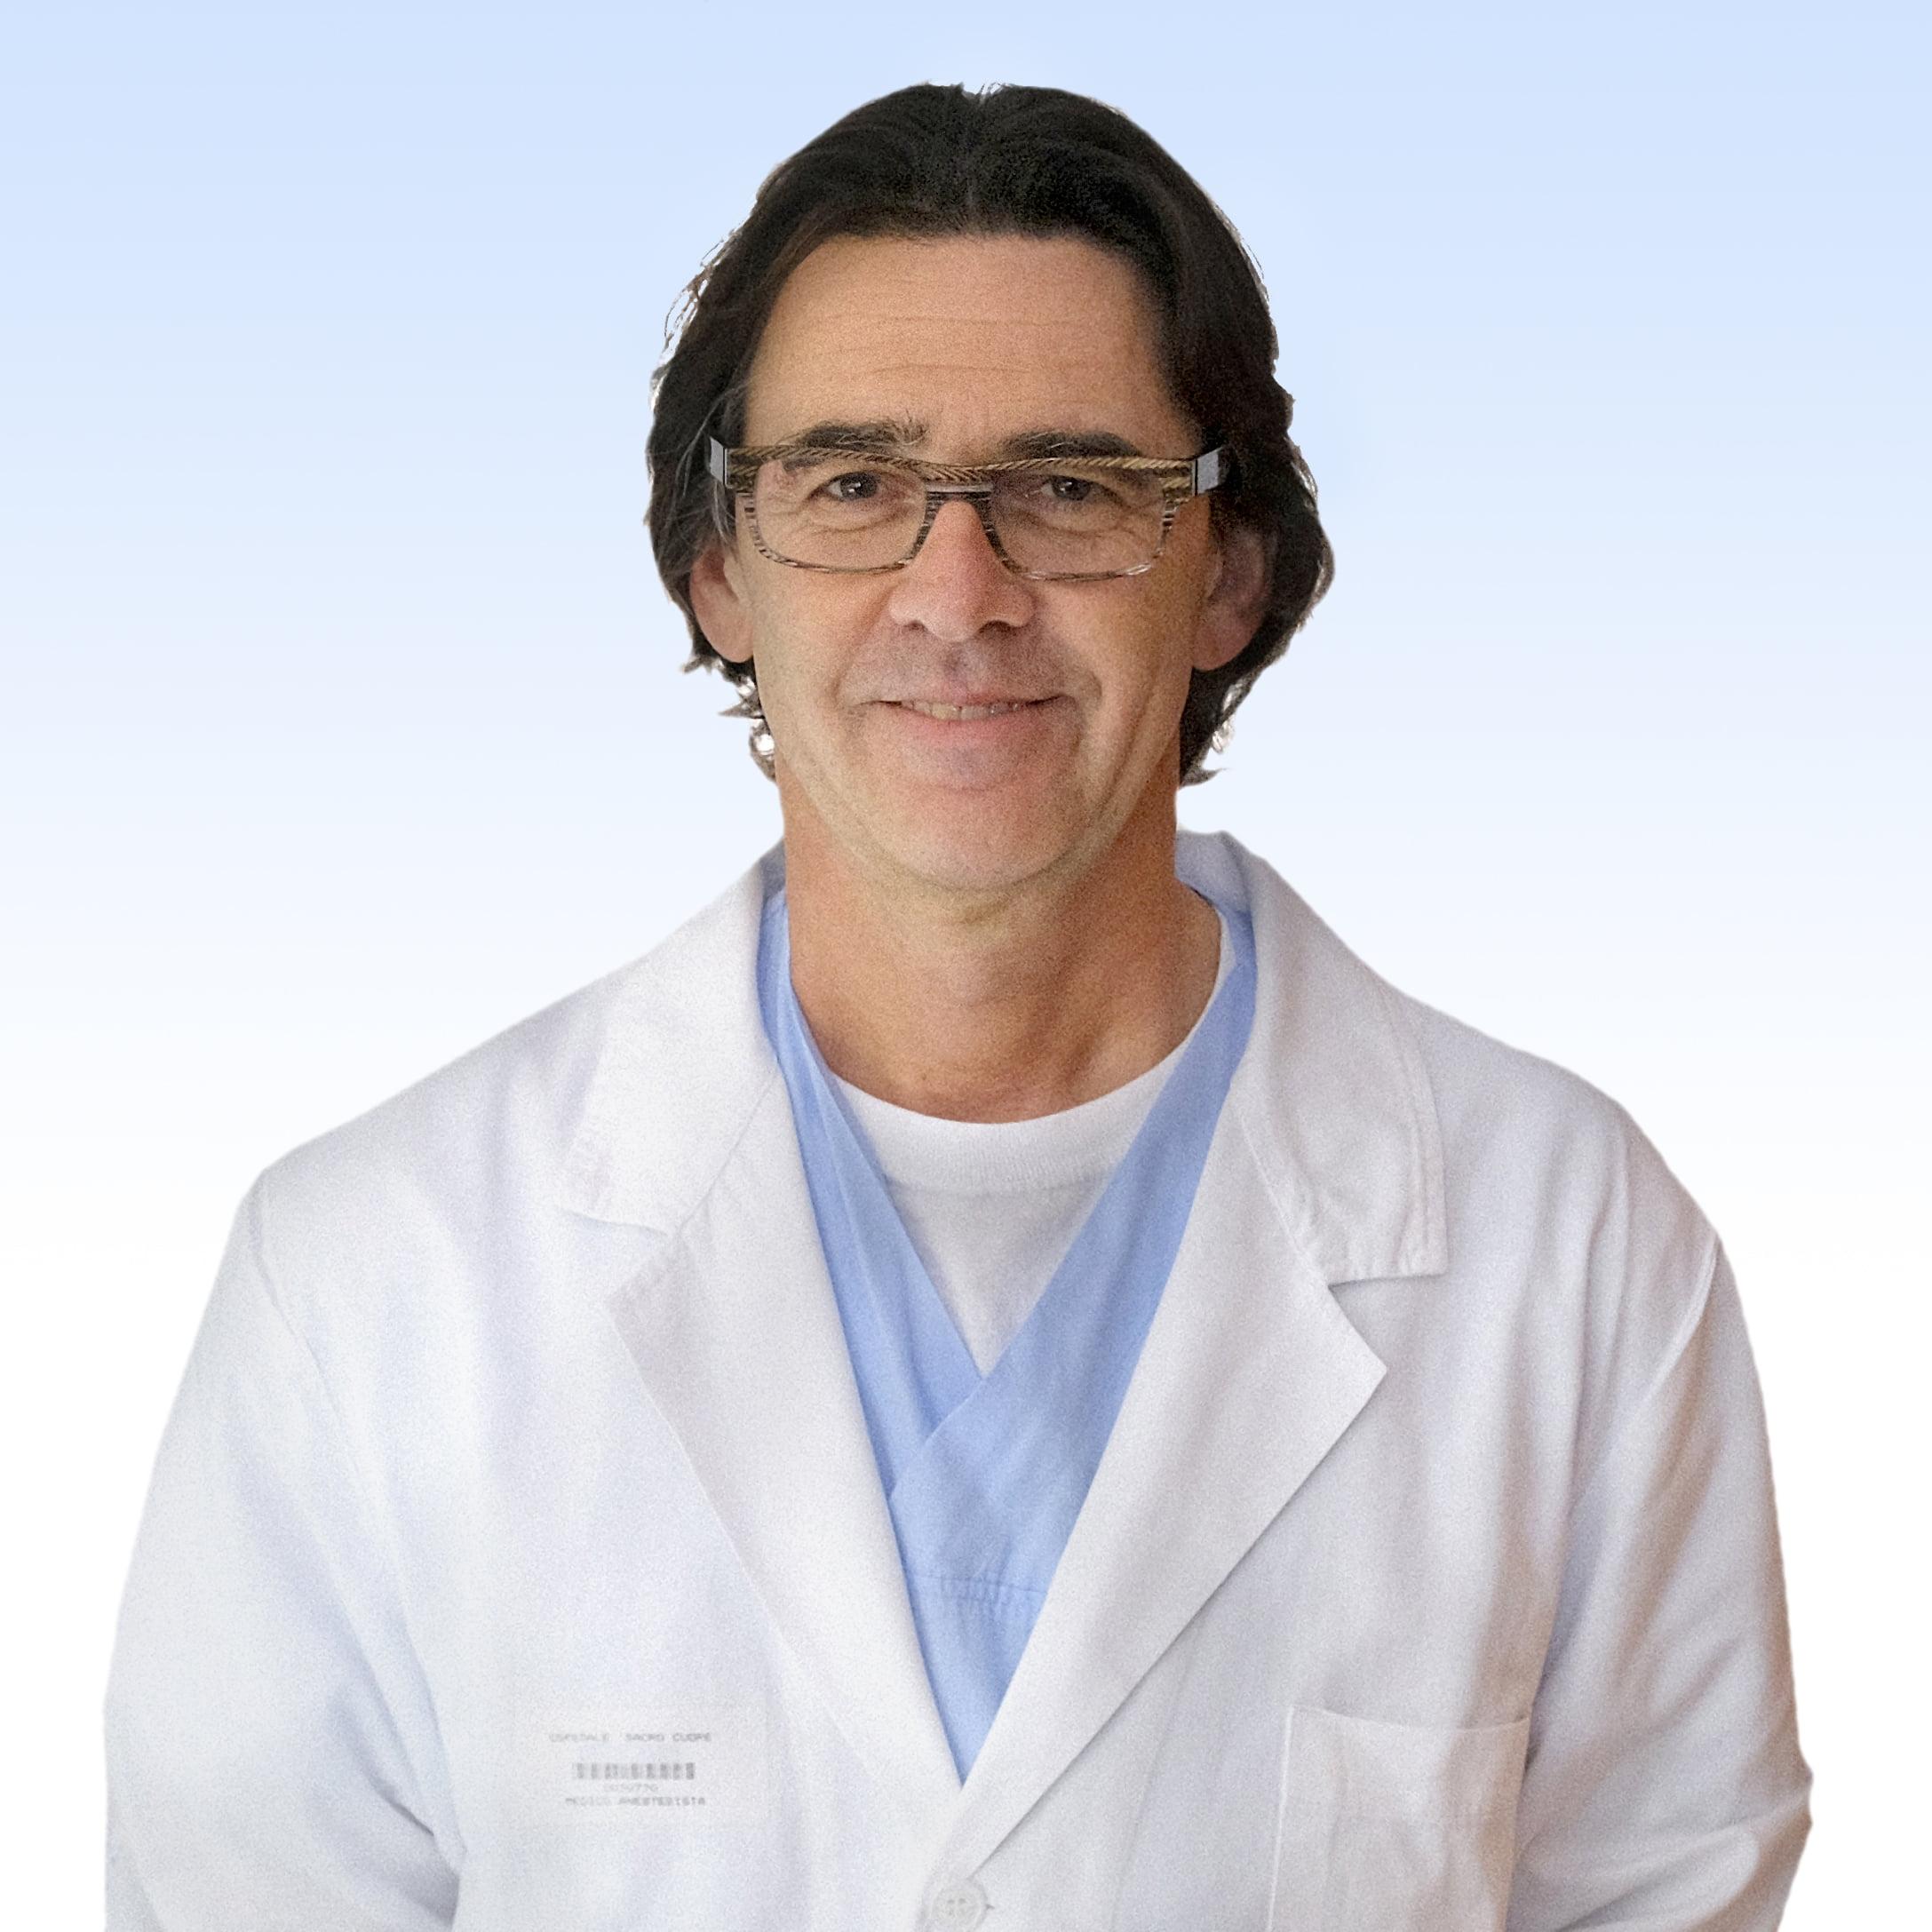 Giorgio Merci, anestesista Irccs Ospedale Sacro Cuore Don Calabria di Negrar